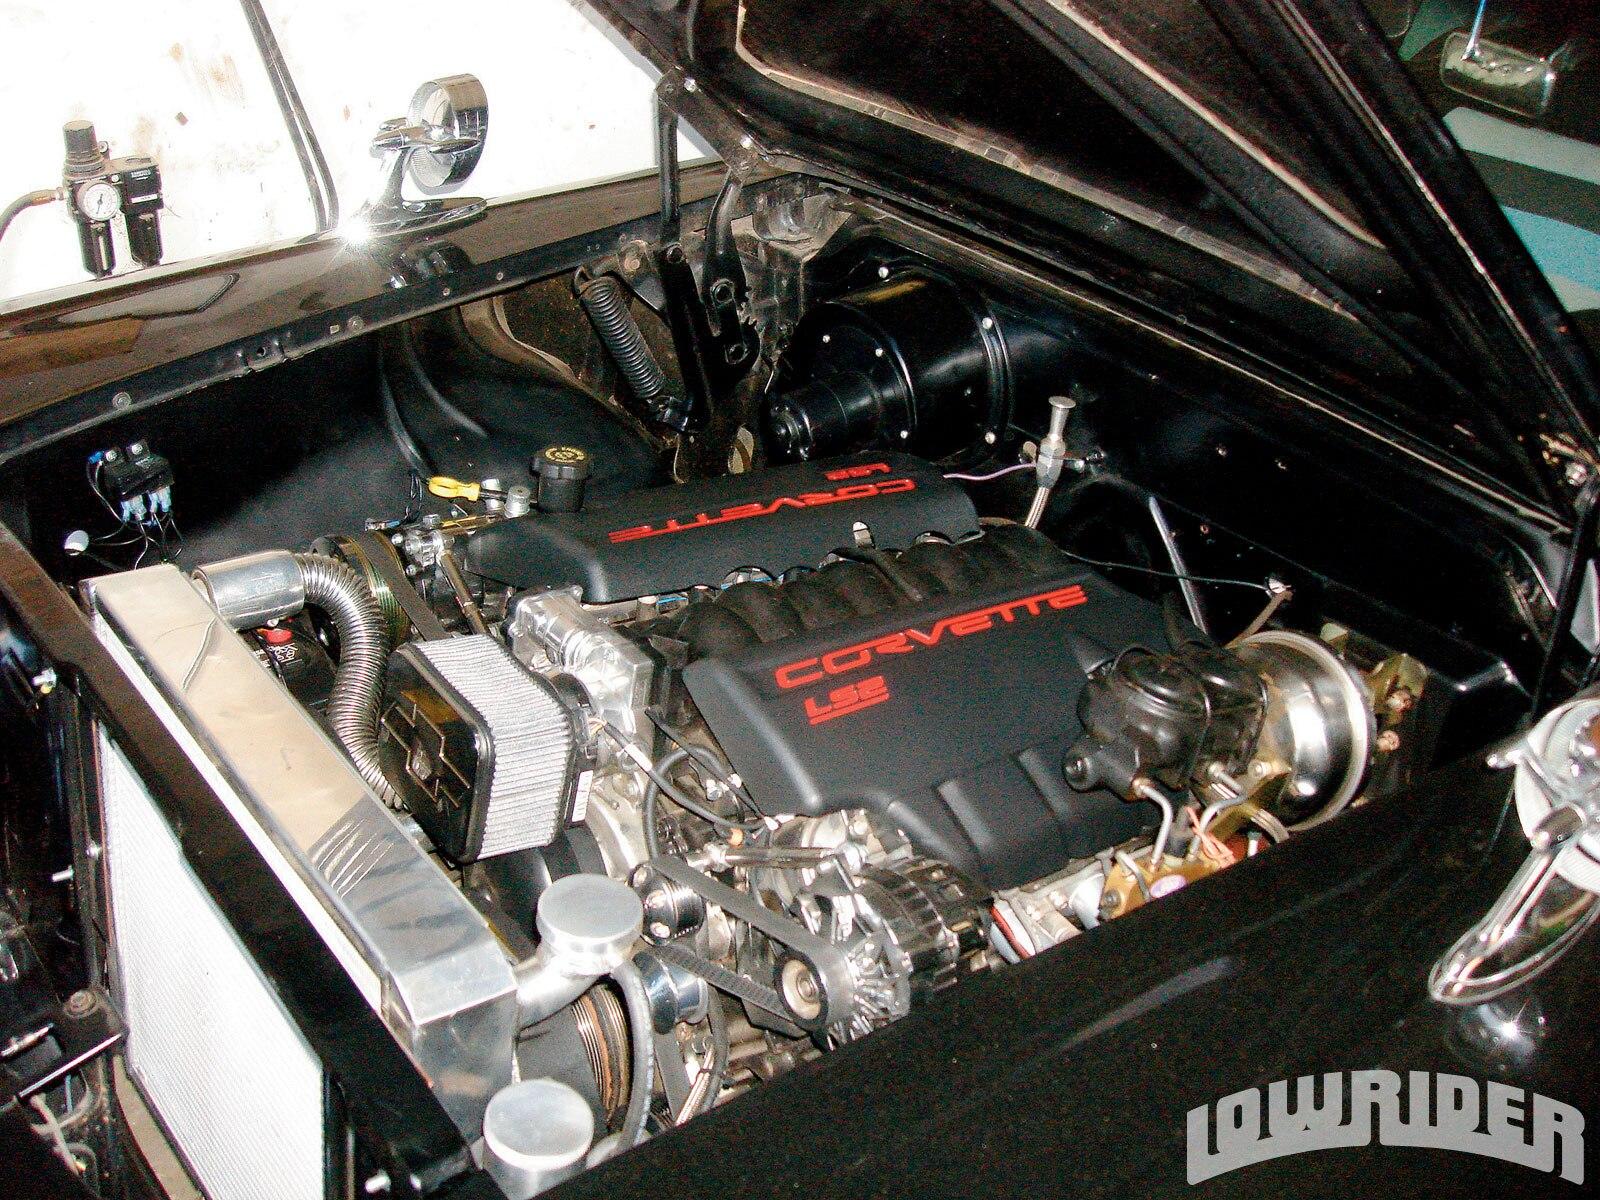 lrmp_1001_01_o-general_motors_ls_series_engine_build-1958_chevy_impala3